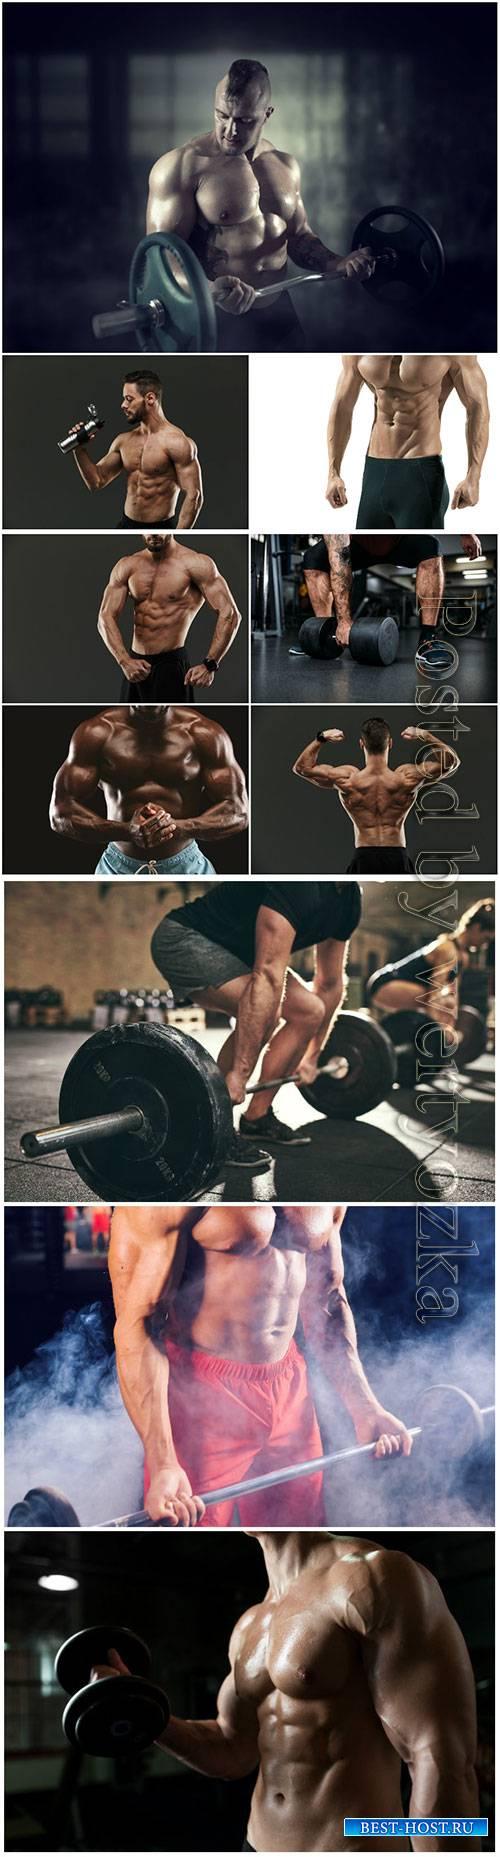 Sports men beautiful stock photo